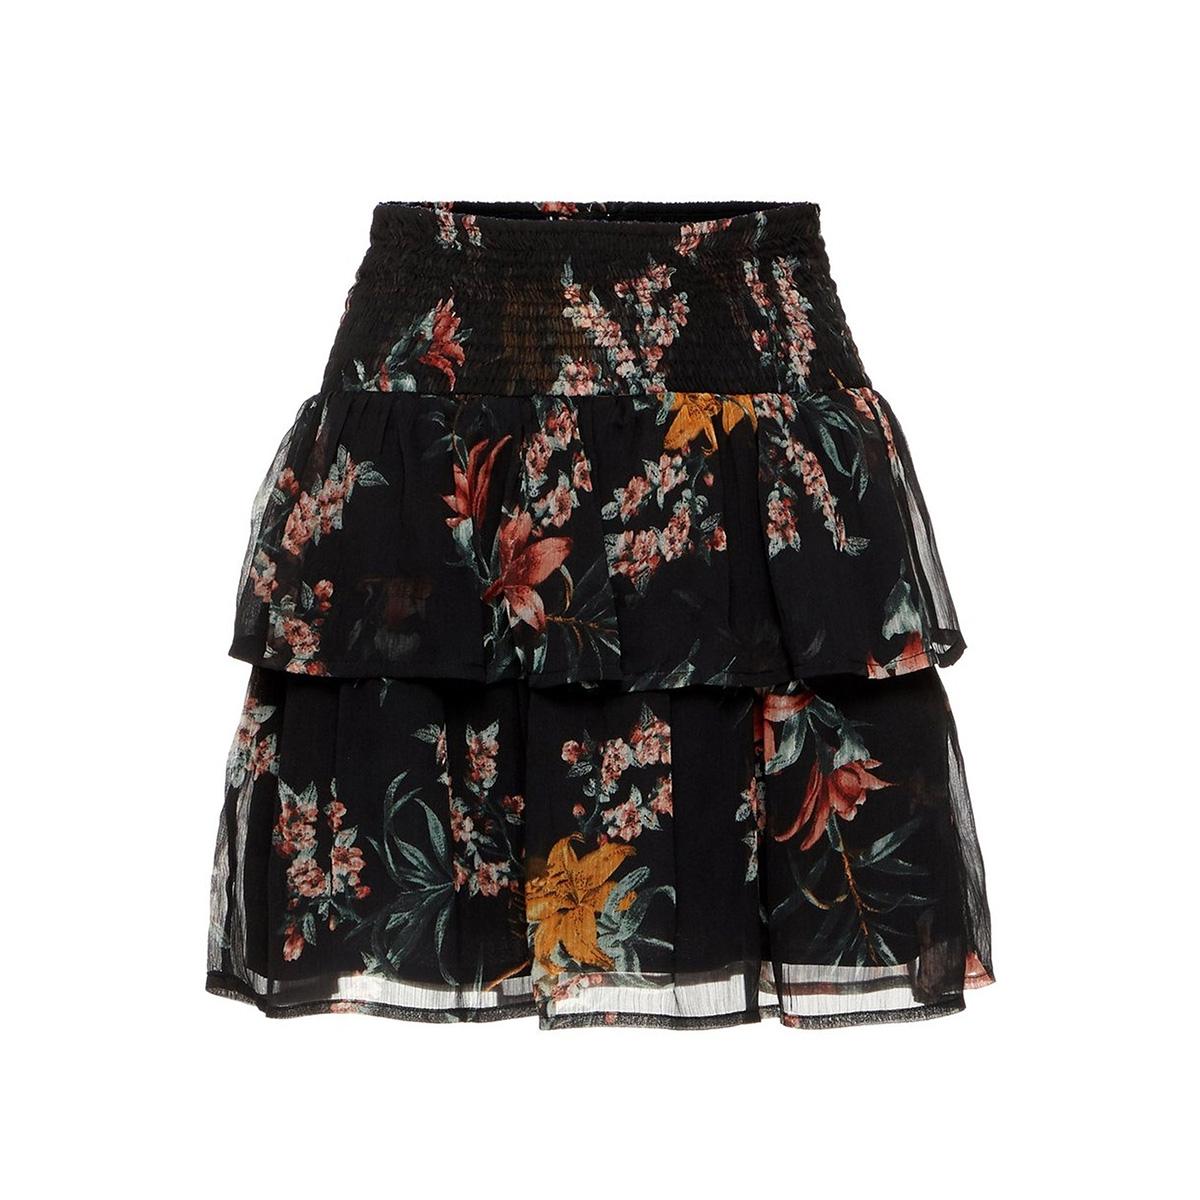 vmwonda h/w smock short skirt exp 10217174 vero moda rok black